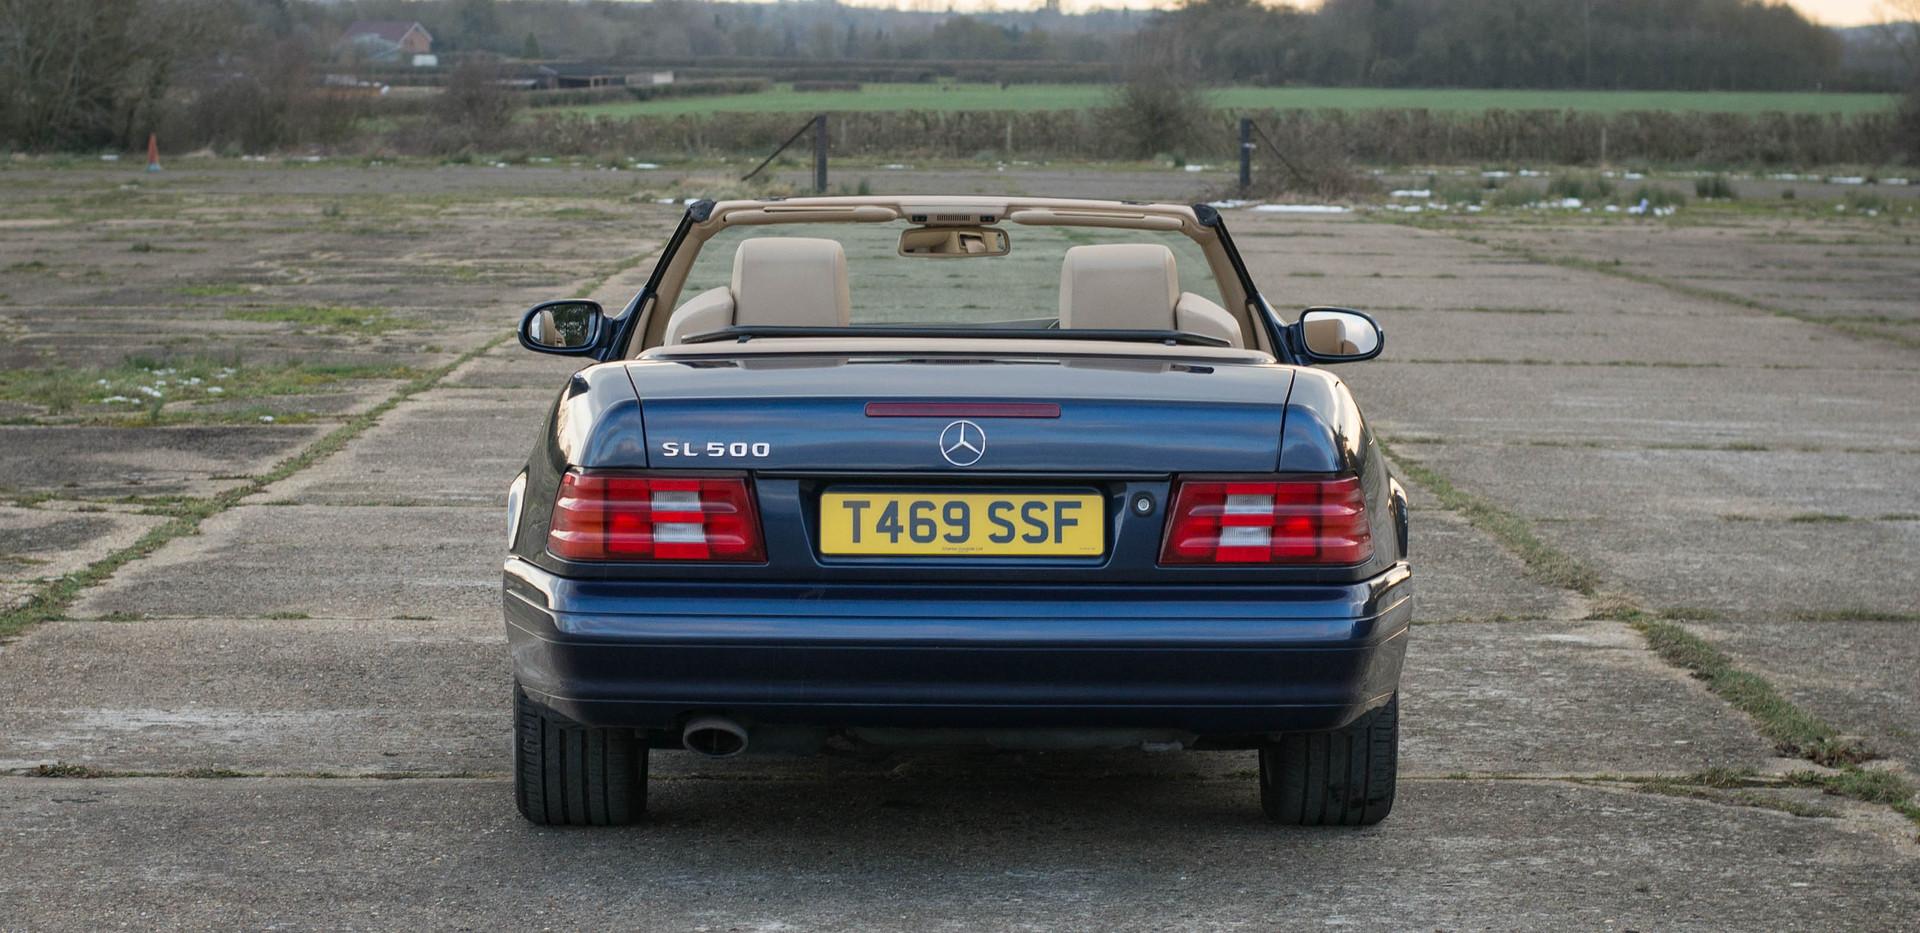 SL500 For Sale UK London  (9 of 36).jpg